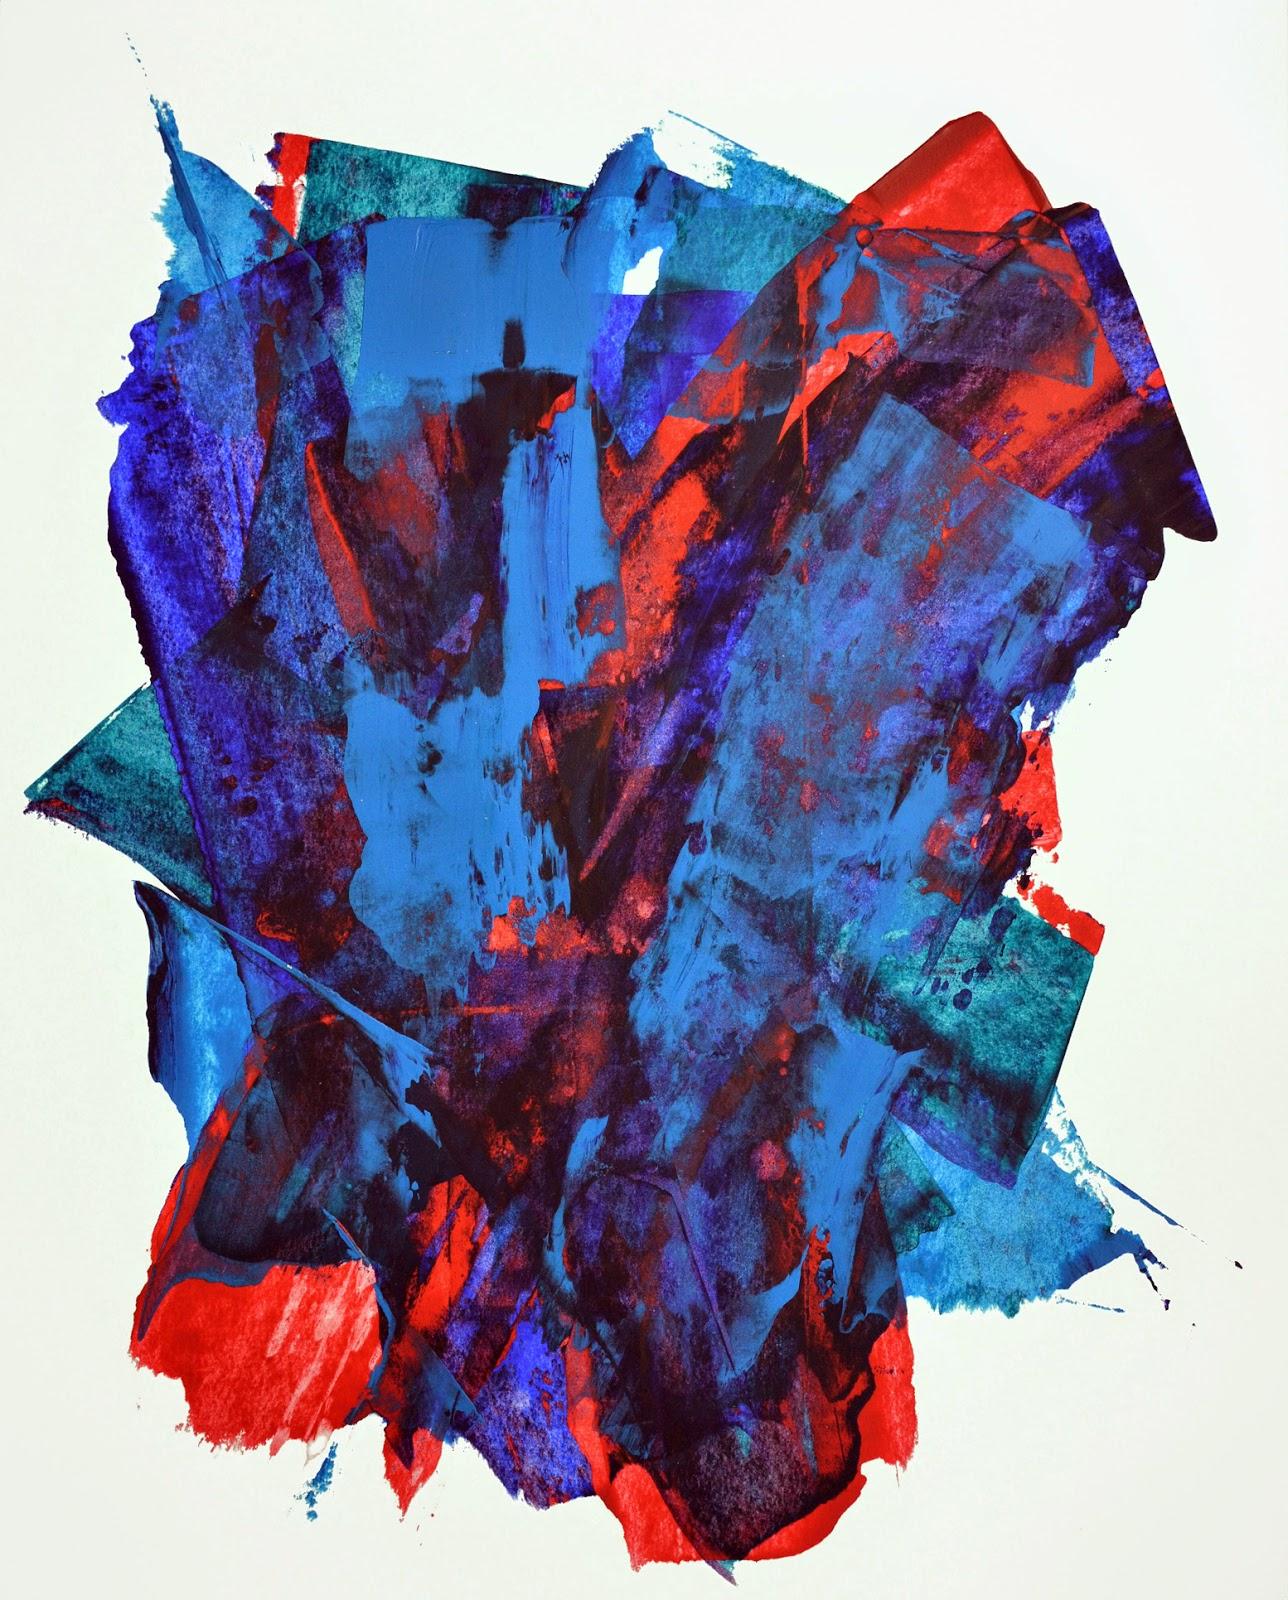 jbb artiste peintre bordeaux france